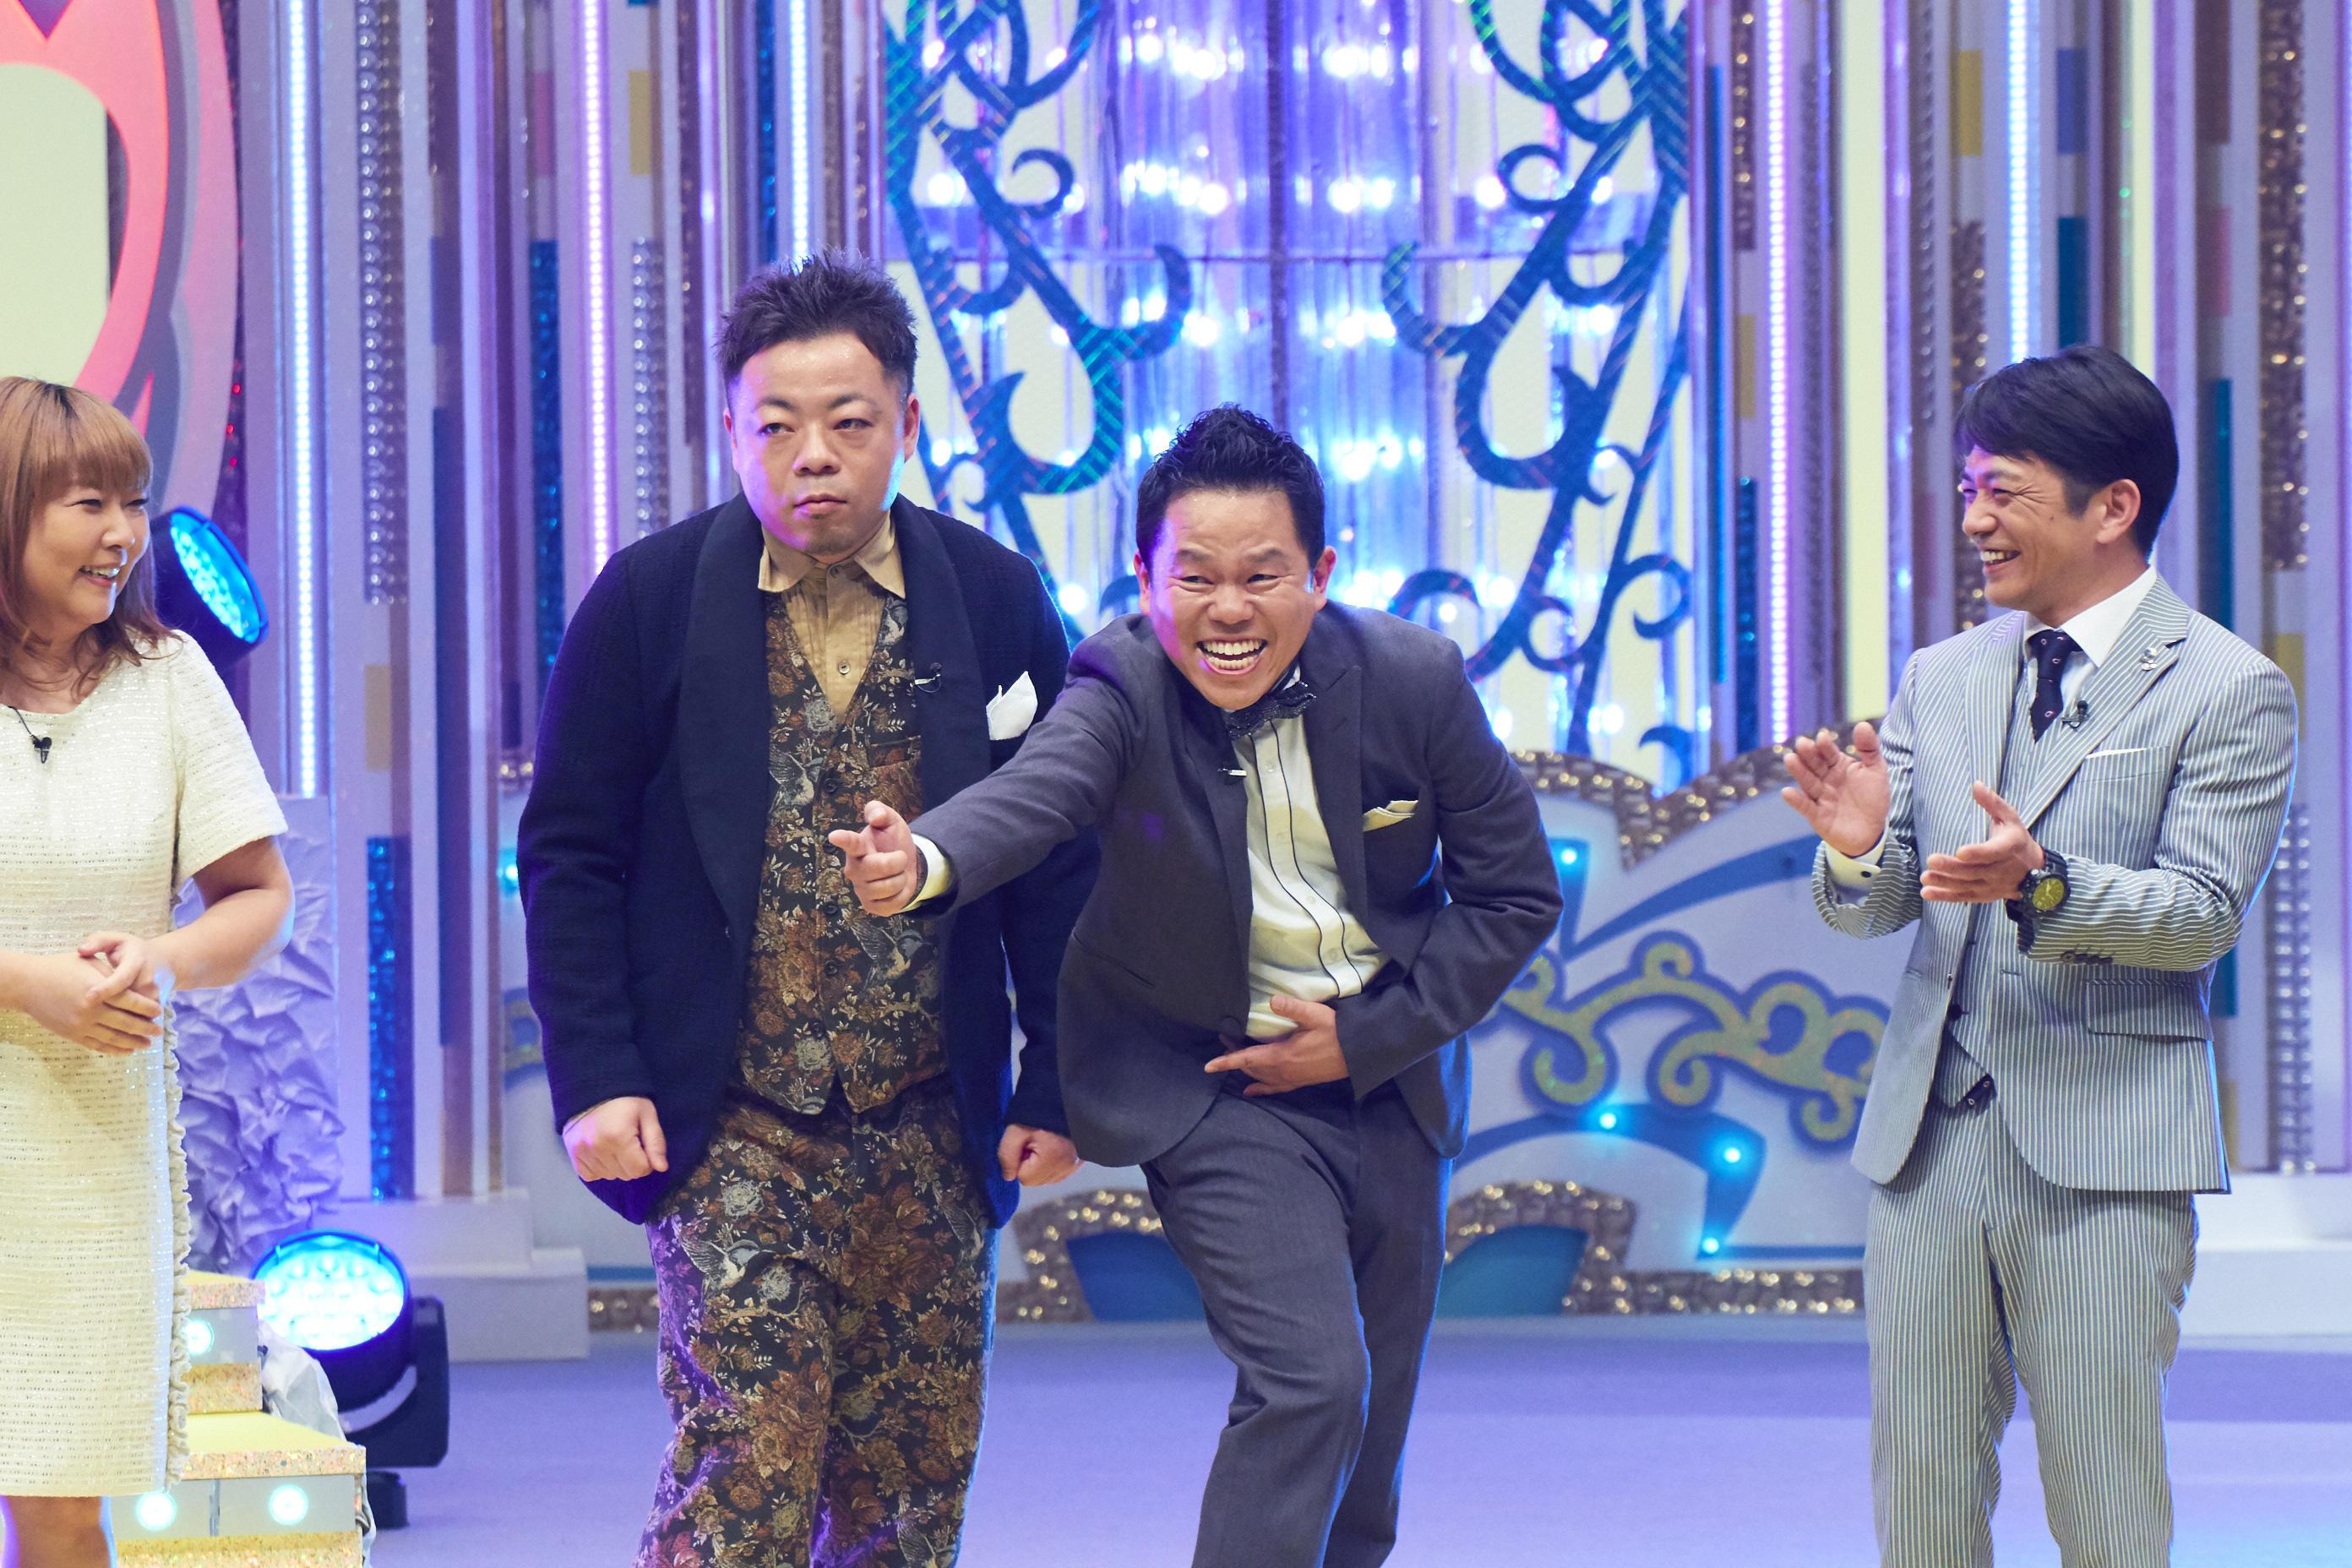 http://news.yoshimoto.co.jp/20180409144143-84b31d5659b133f23e9773a9552220a4cb6786e1.jpg